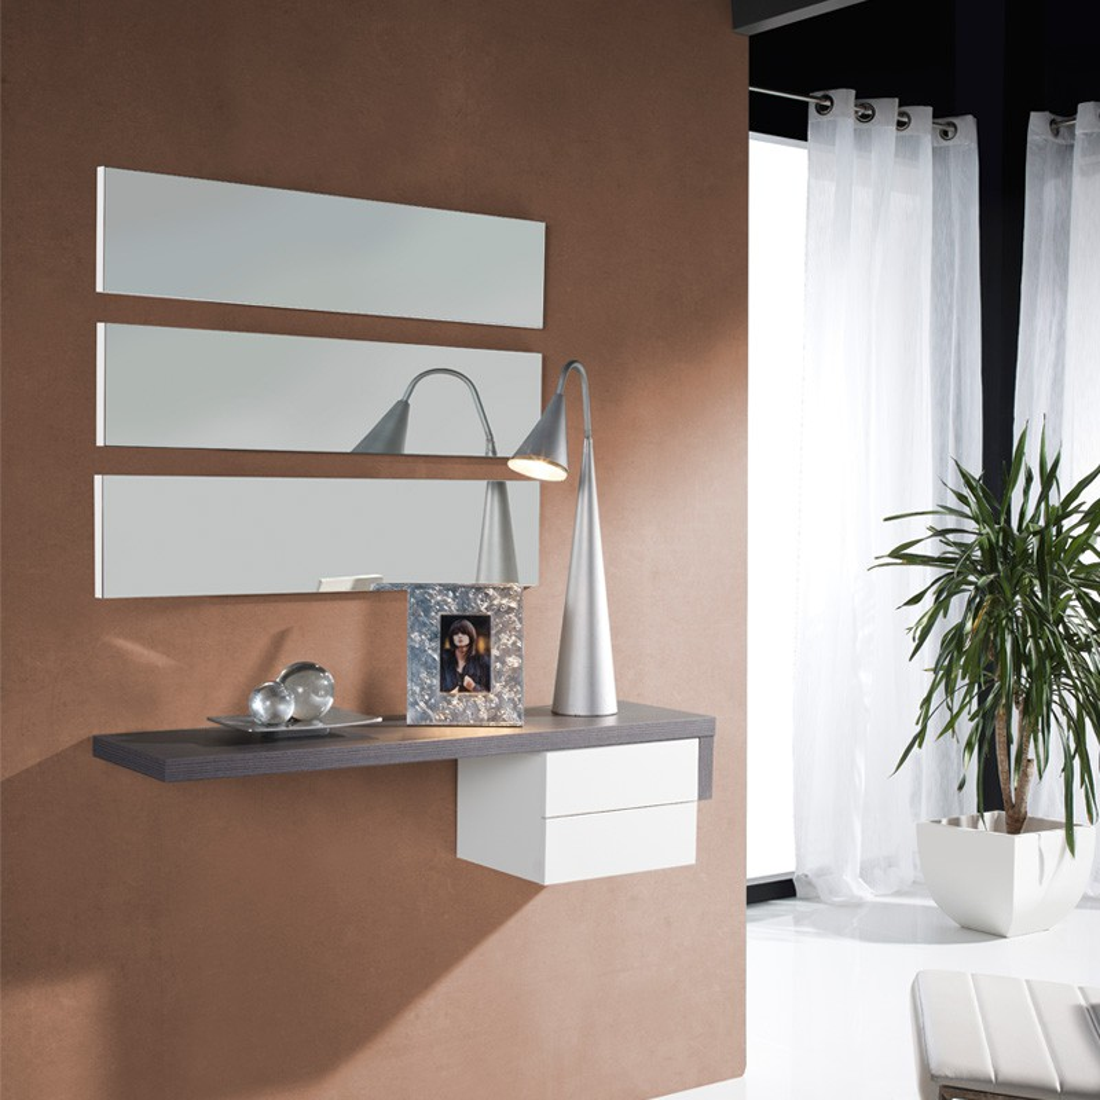 meuble d 39 entr e cendre miroir posti univers petits meubles. Black Bedroom Furniture Sets. Home Design Ideas